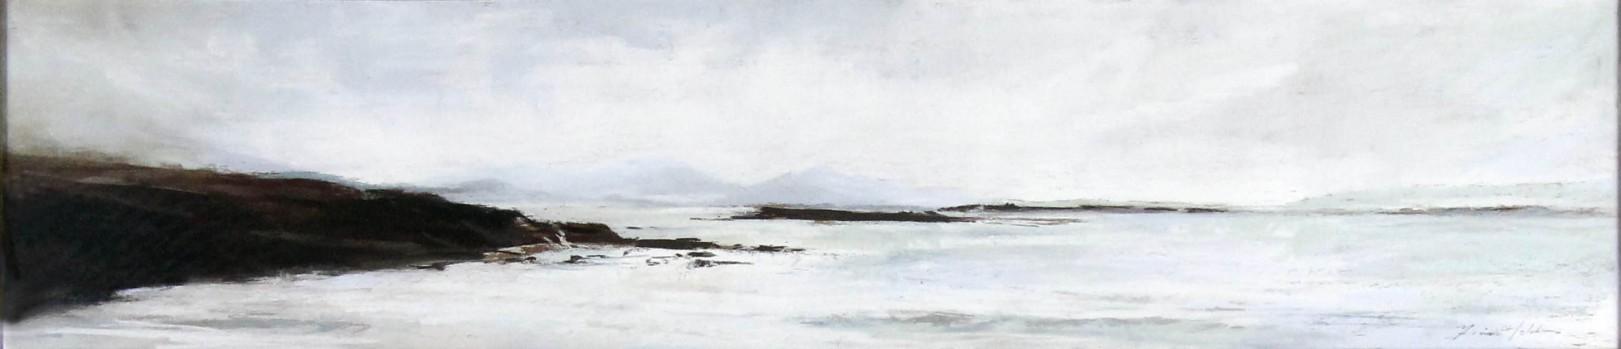 Fiona Haldane_Original_Pastels_Far Islands, Sanna Bay_Image 8 x 36